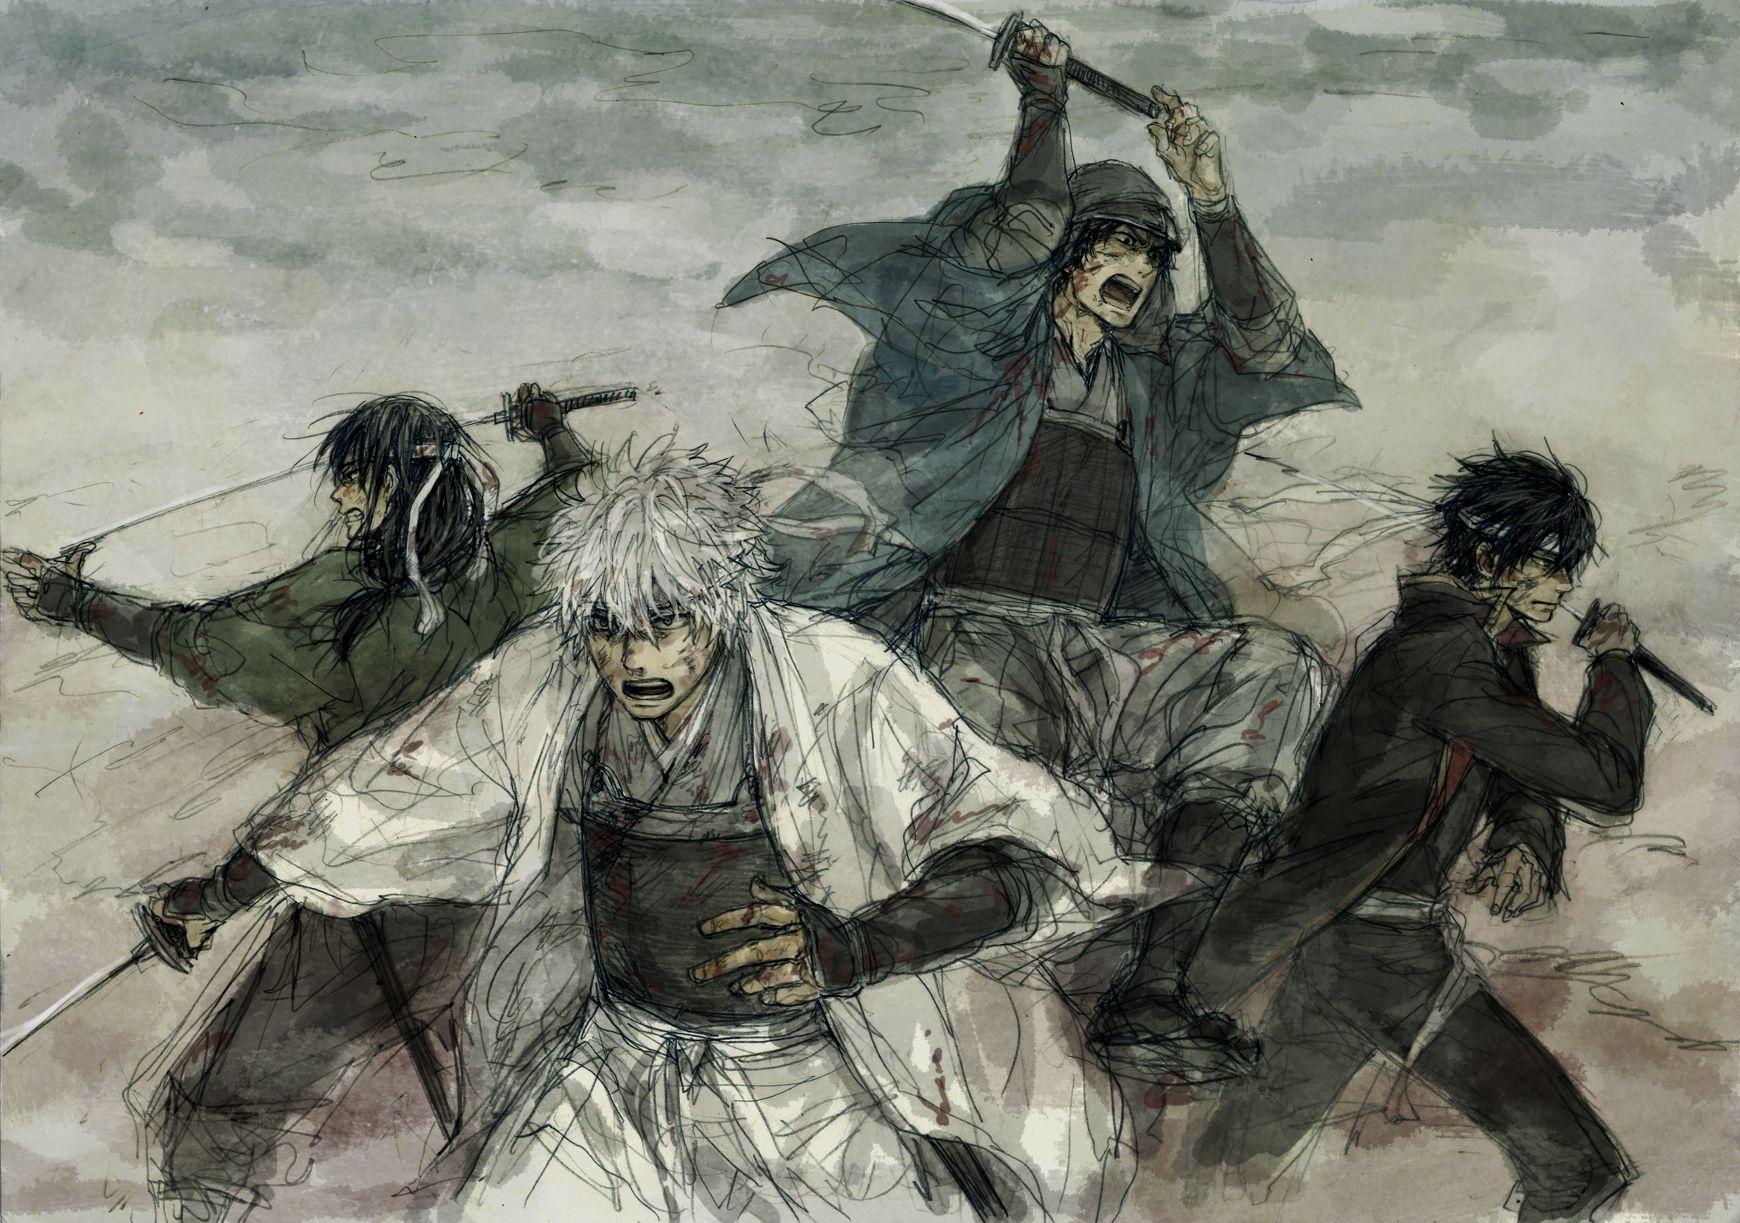 Joui/1878134 Zerochan 銀魂 イラスト, アニメ 銀魂, 高杉晋助